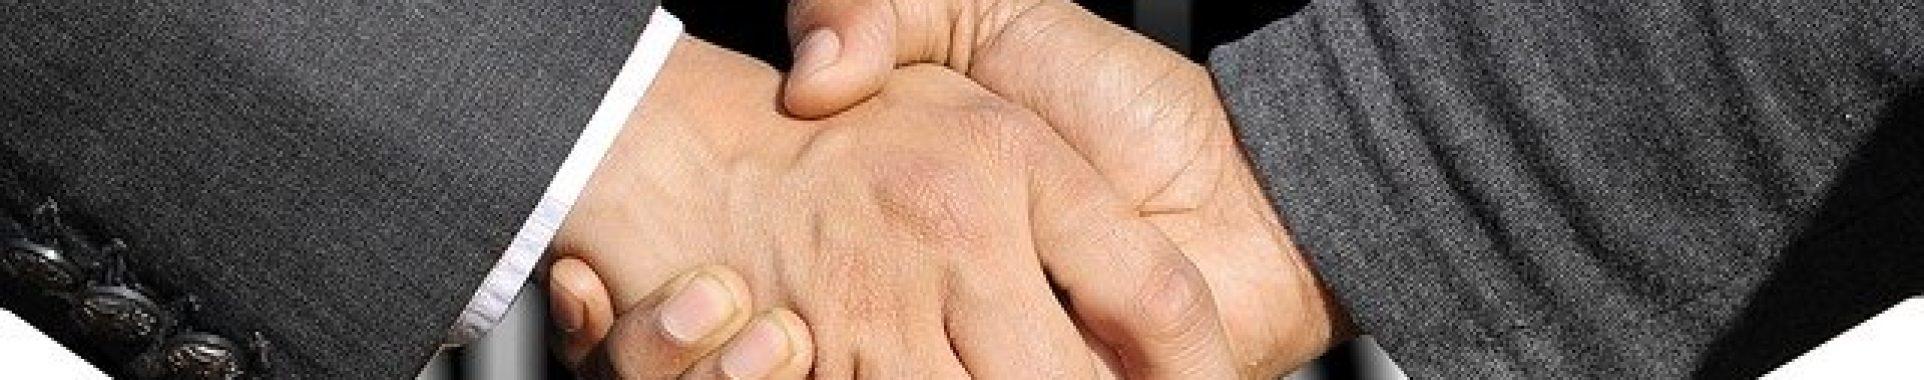 shaking-hands-3091908_640 (1)